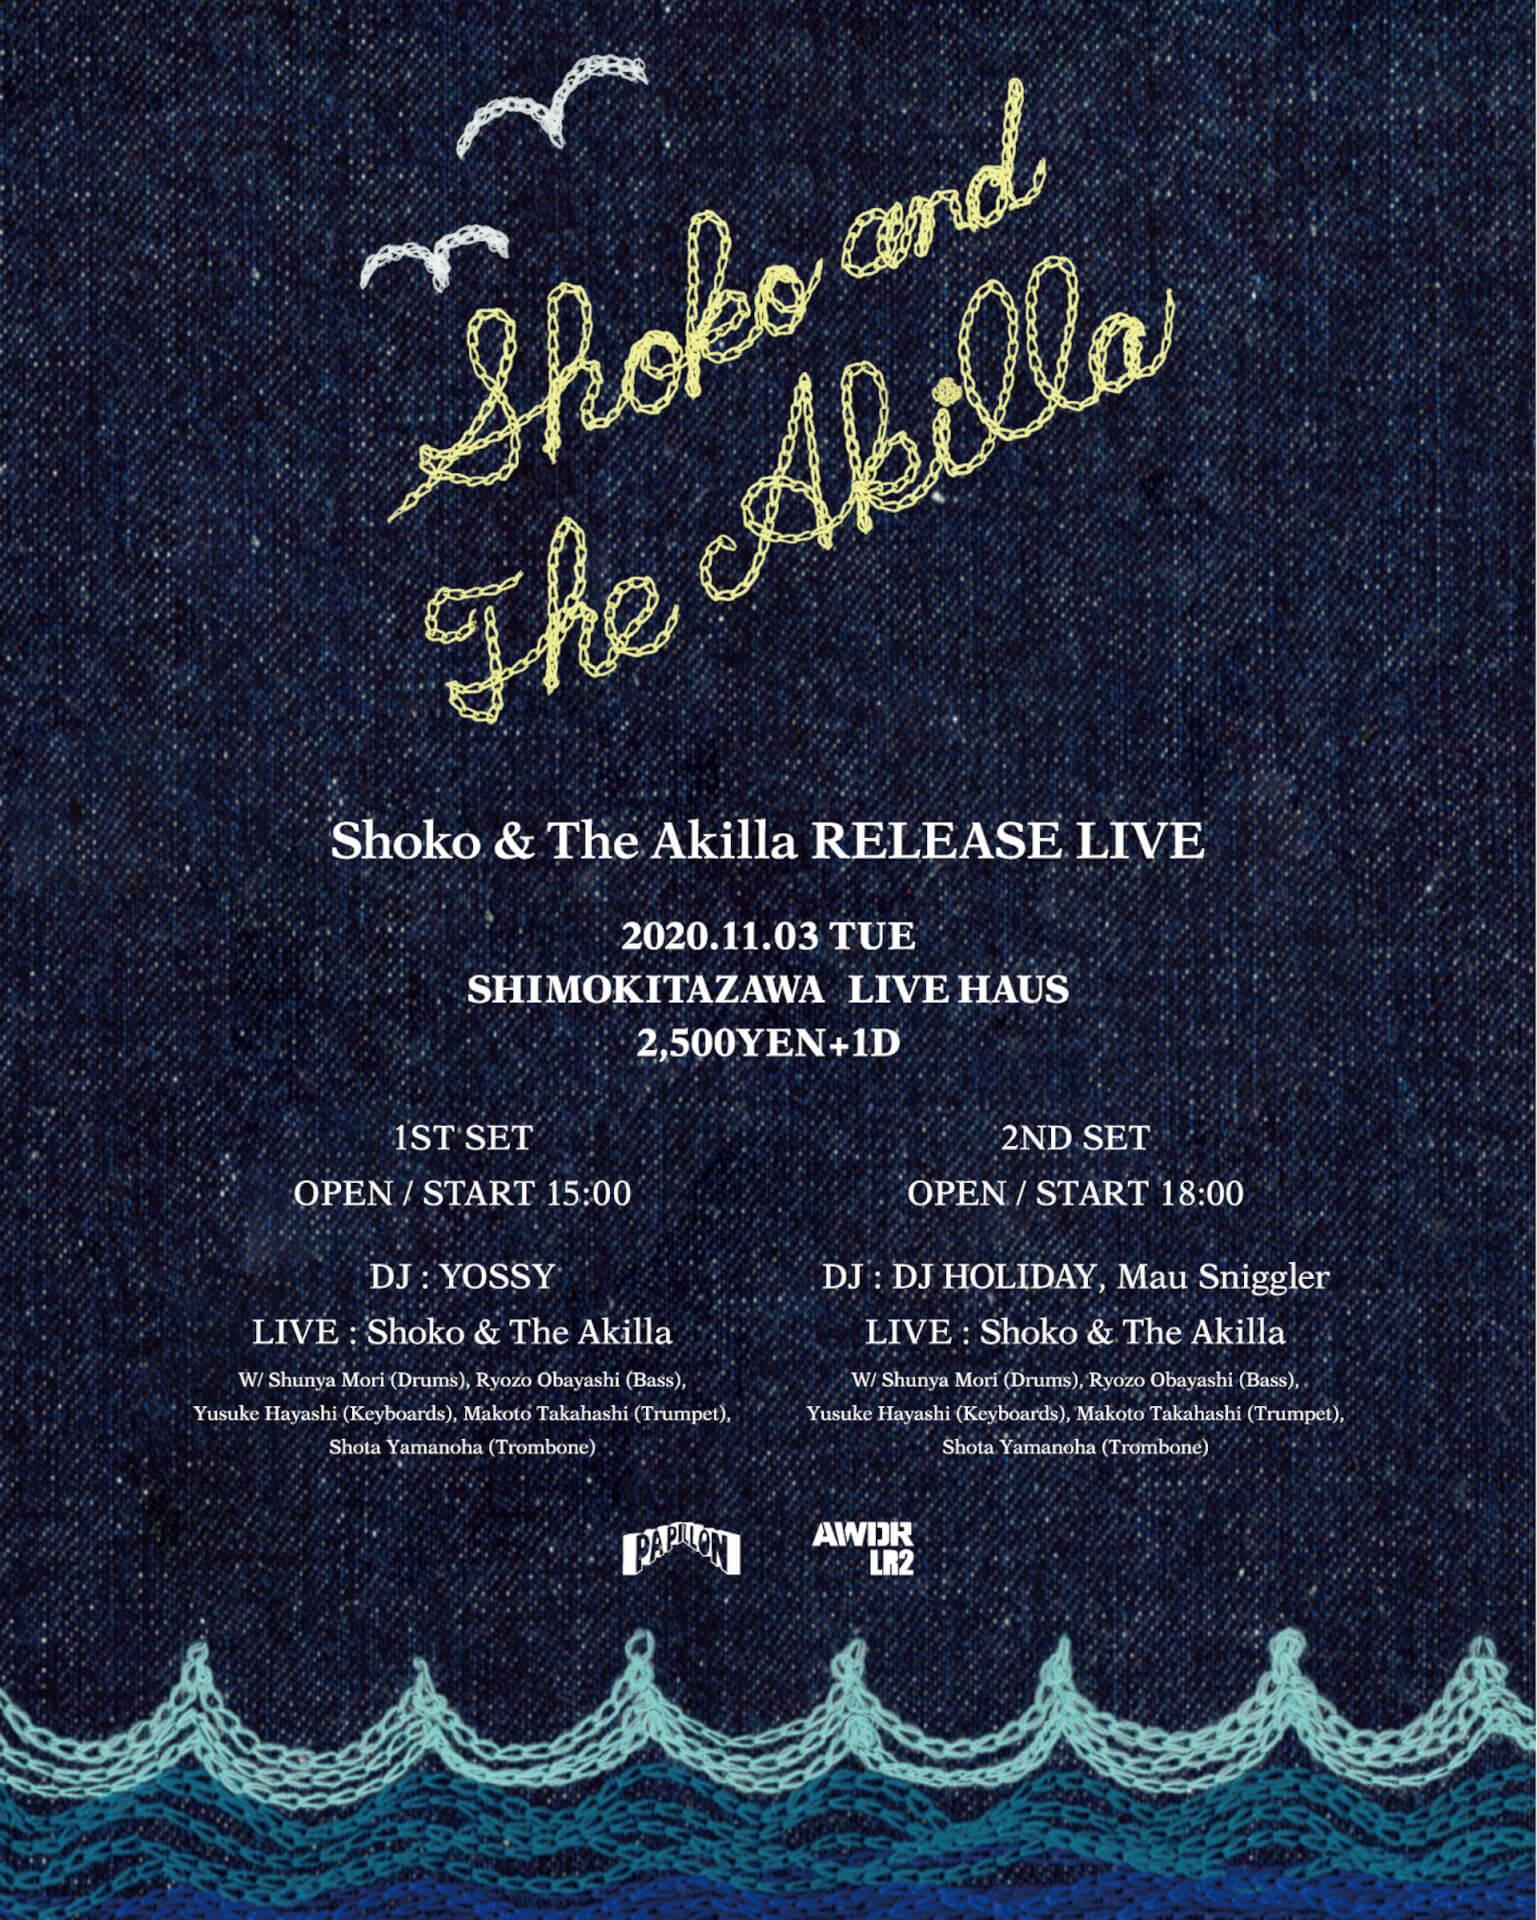 1stアルバムをリリースしたばかりのShoko & Akillaによるレコ発ライブが開催決定!初のバンド編成でのライブに music201002_shokoandtheakilla_1